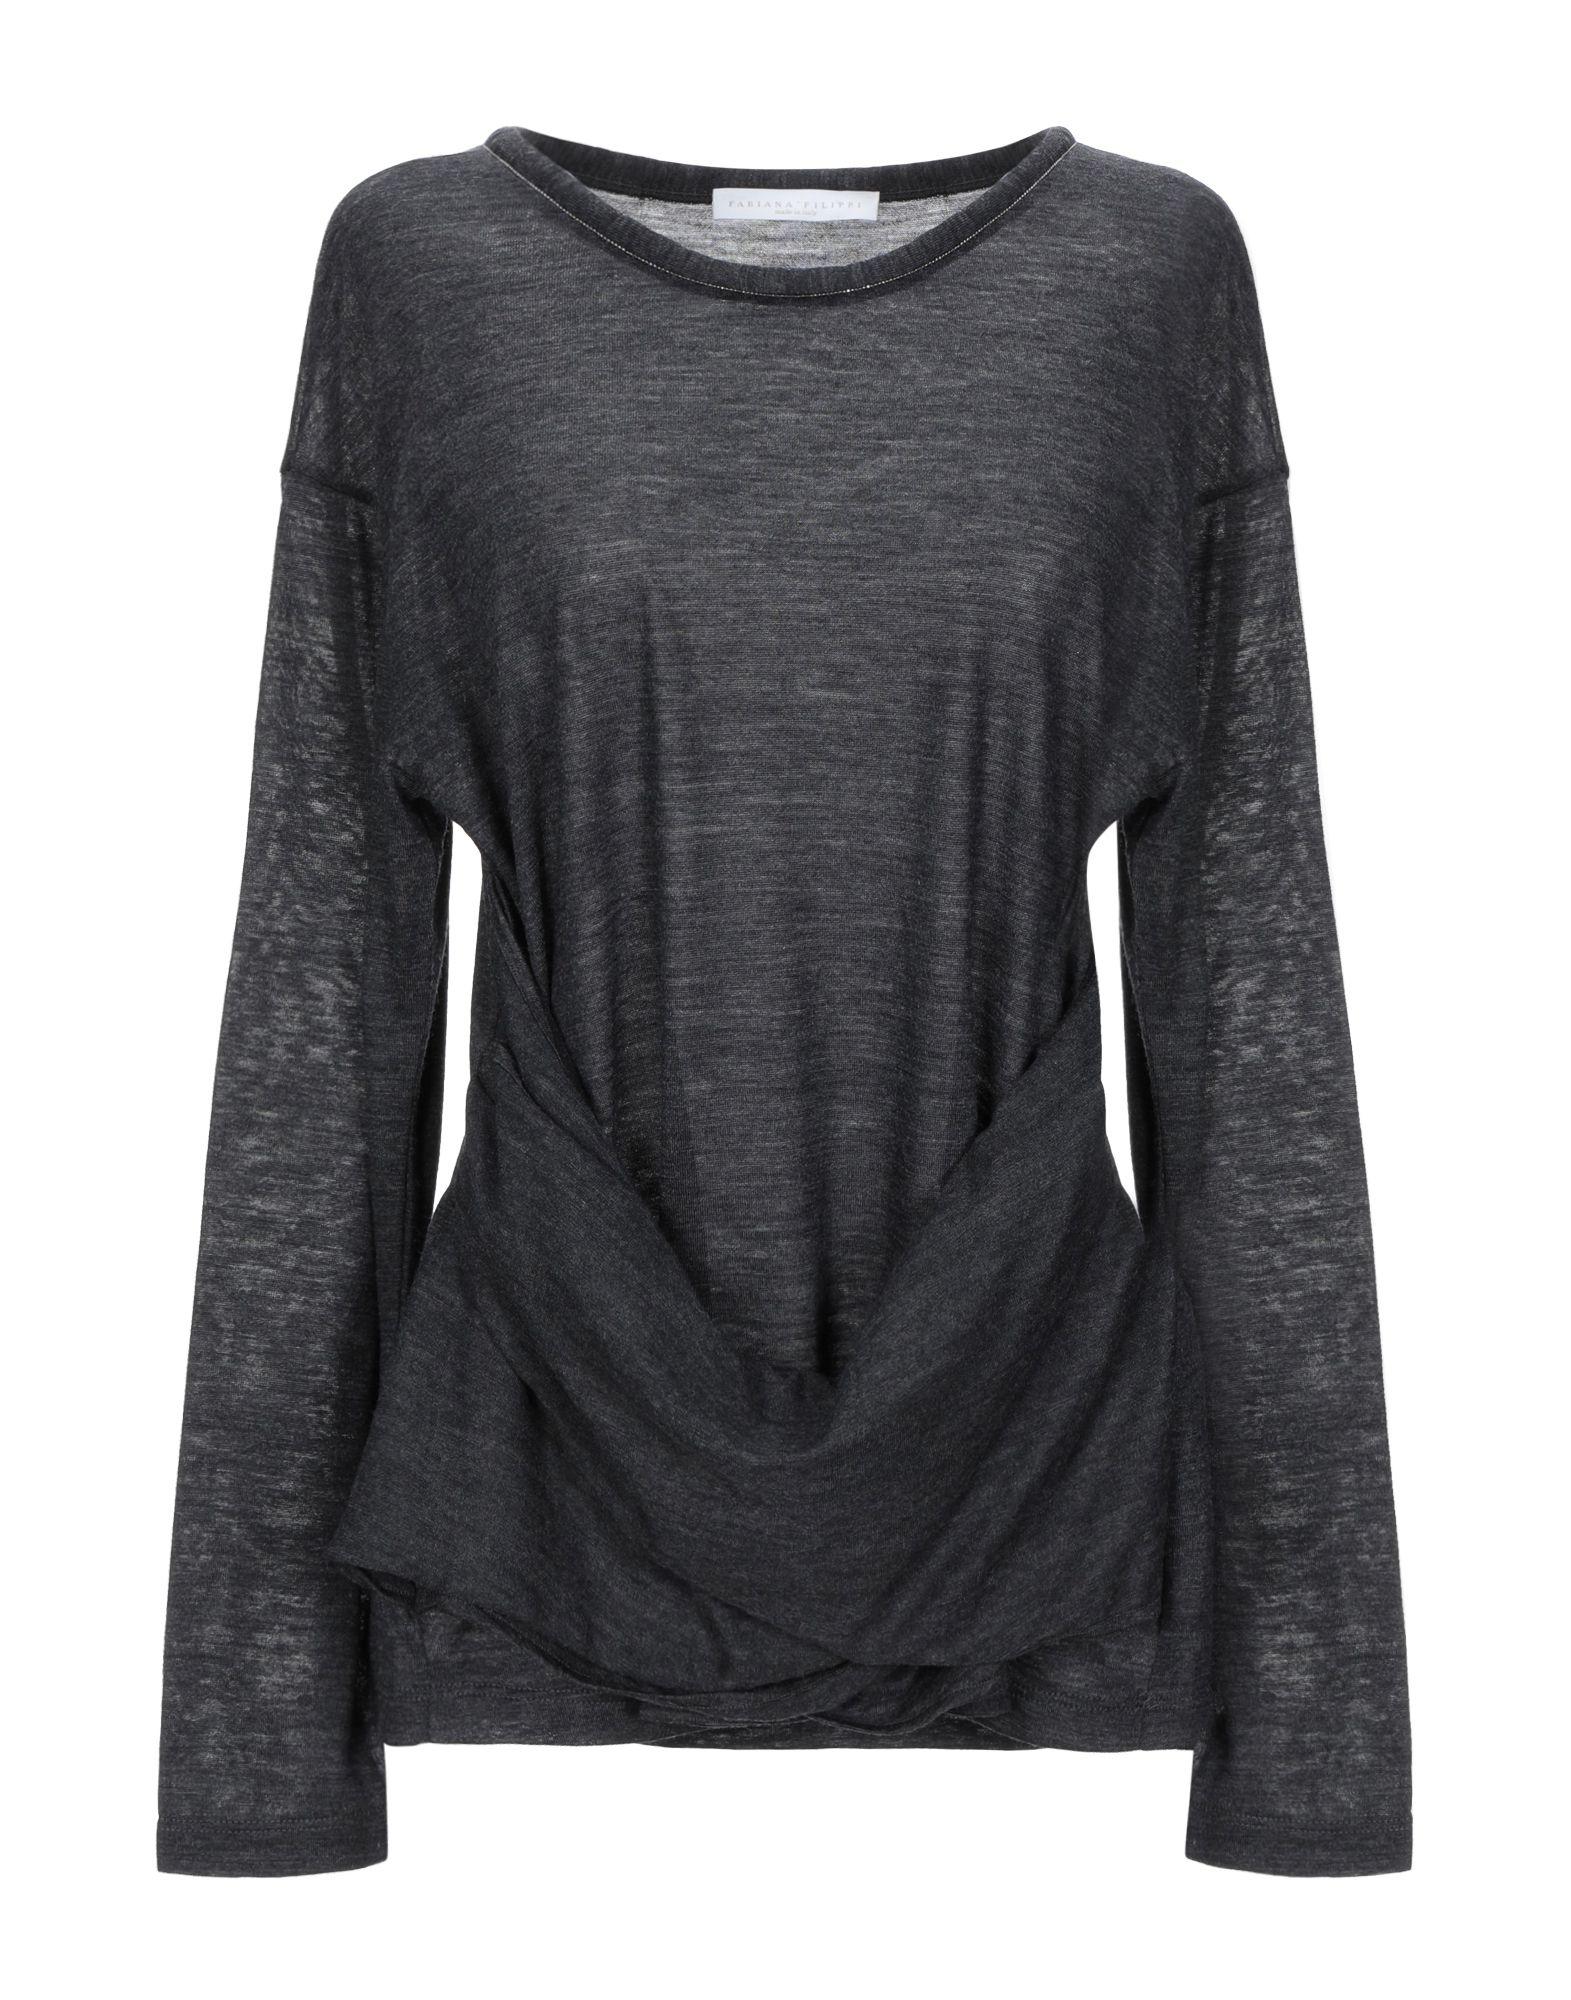 FABIANA FILIPPI Sweaters - Item 39992913